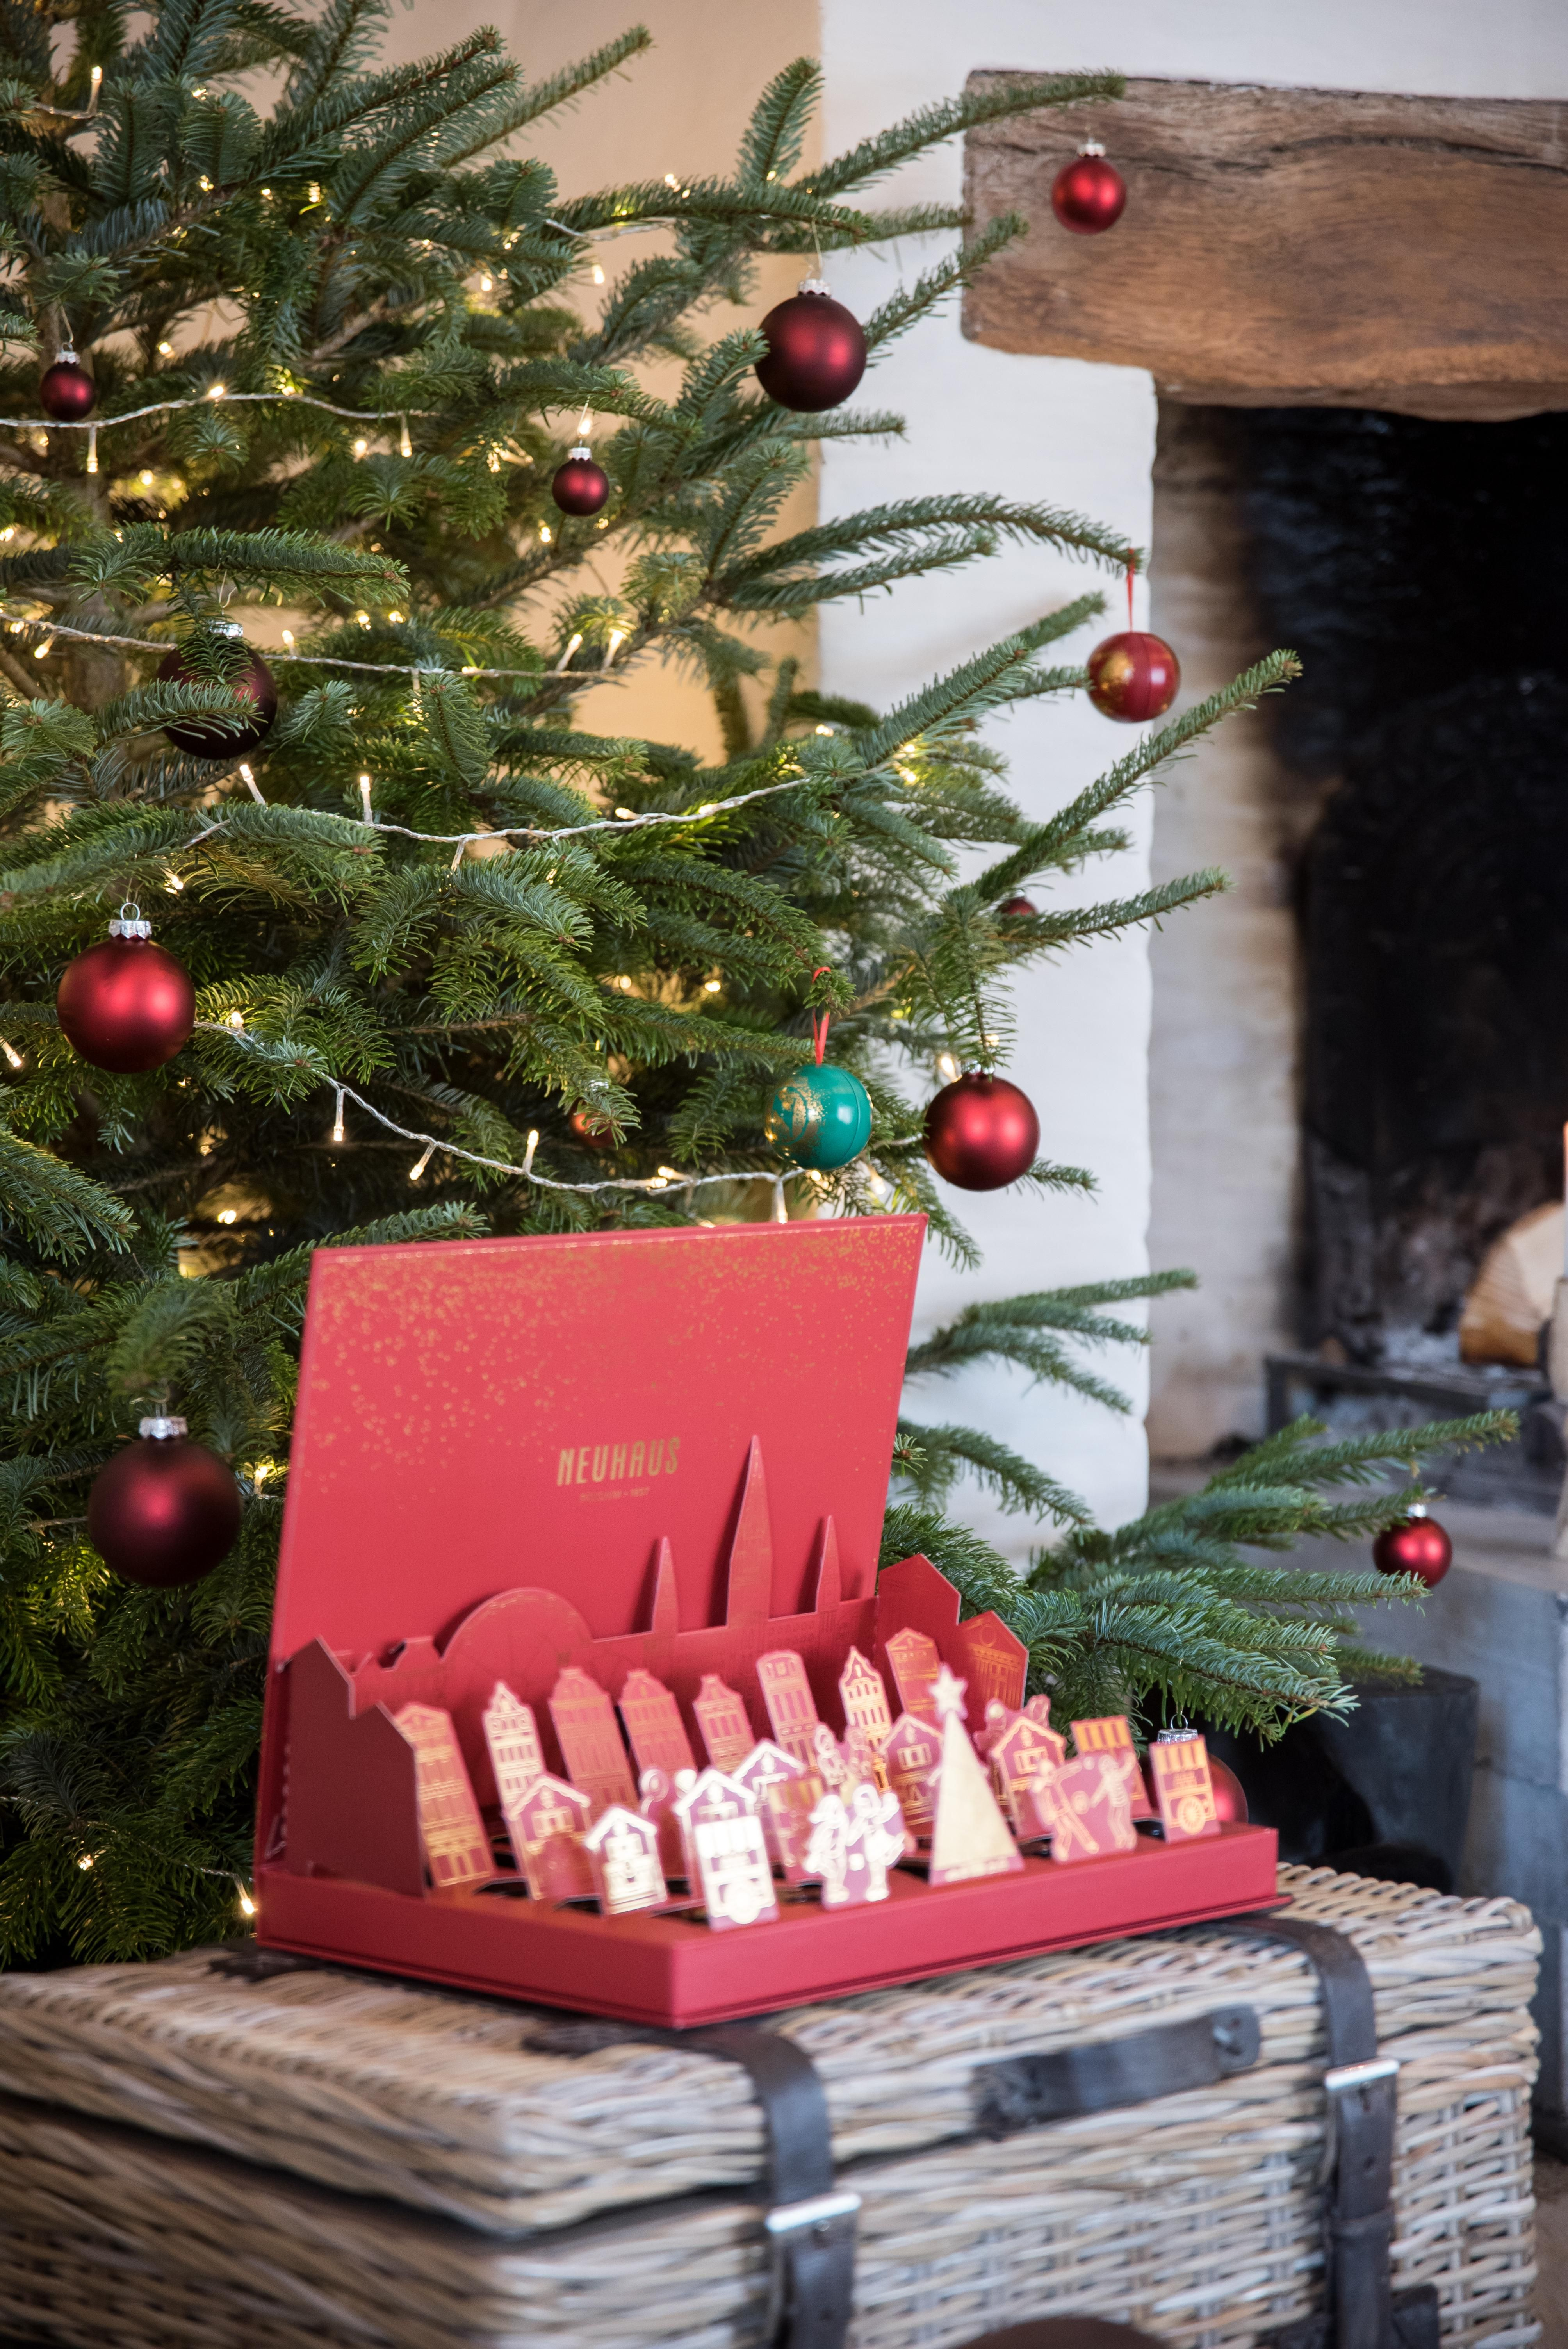 Chocolate Advent Calendar 2019.Neuhaus Chocolate Winter Wonderland Pop Up Advent Calendar 25 Pcs